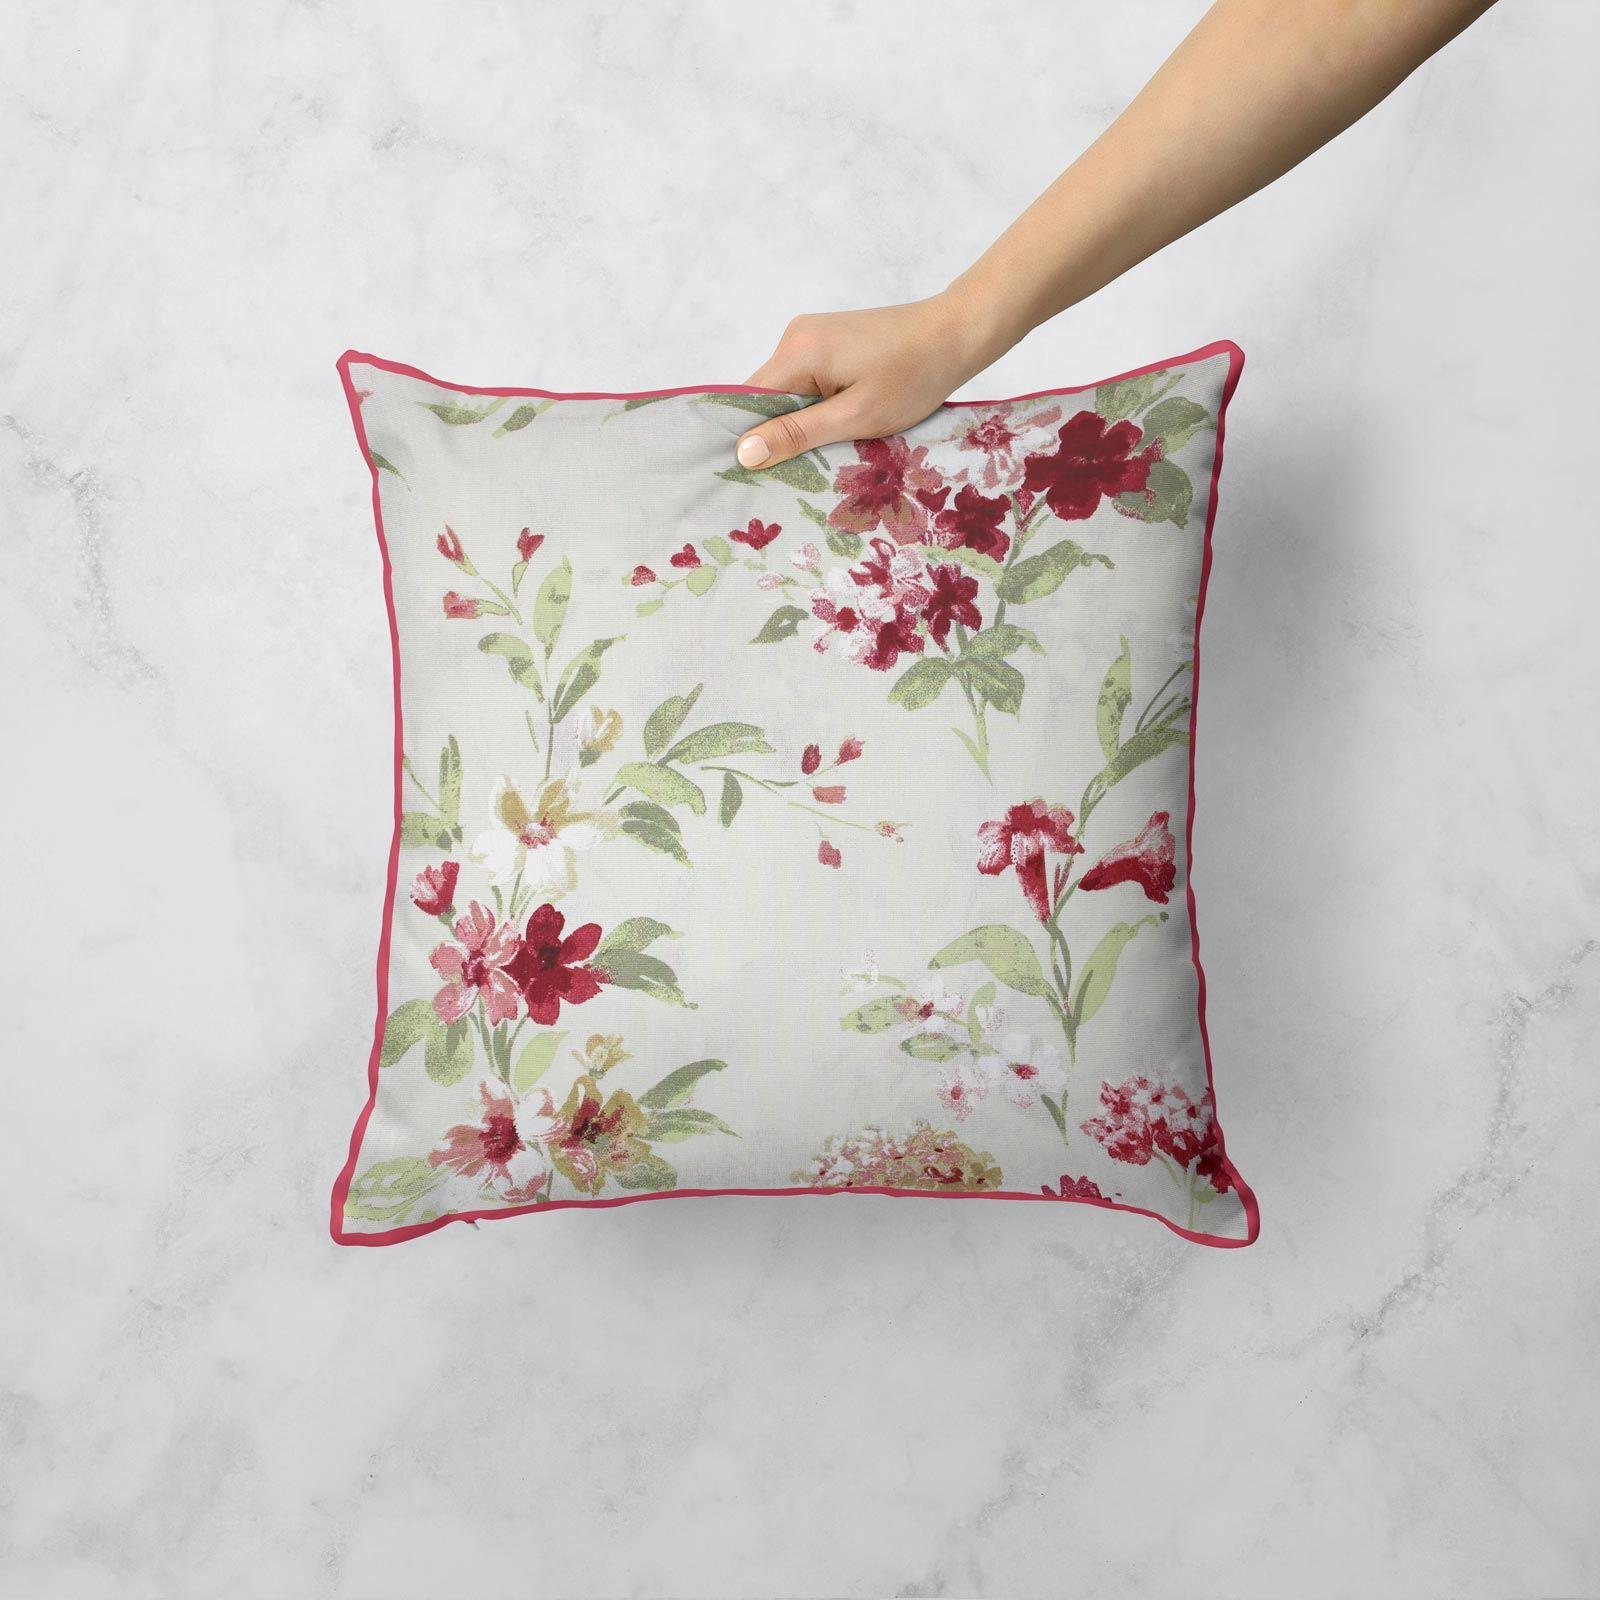 Vino-Tinto-Cushion-Covers-Coleccion-17-034-18-034-43cm-45cm-Cubierta miniatura 23